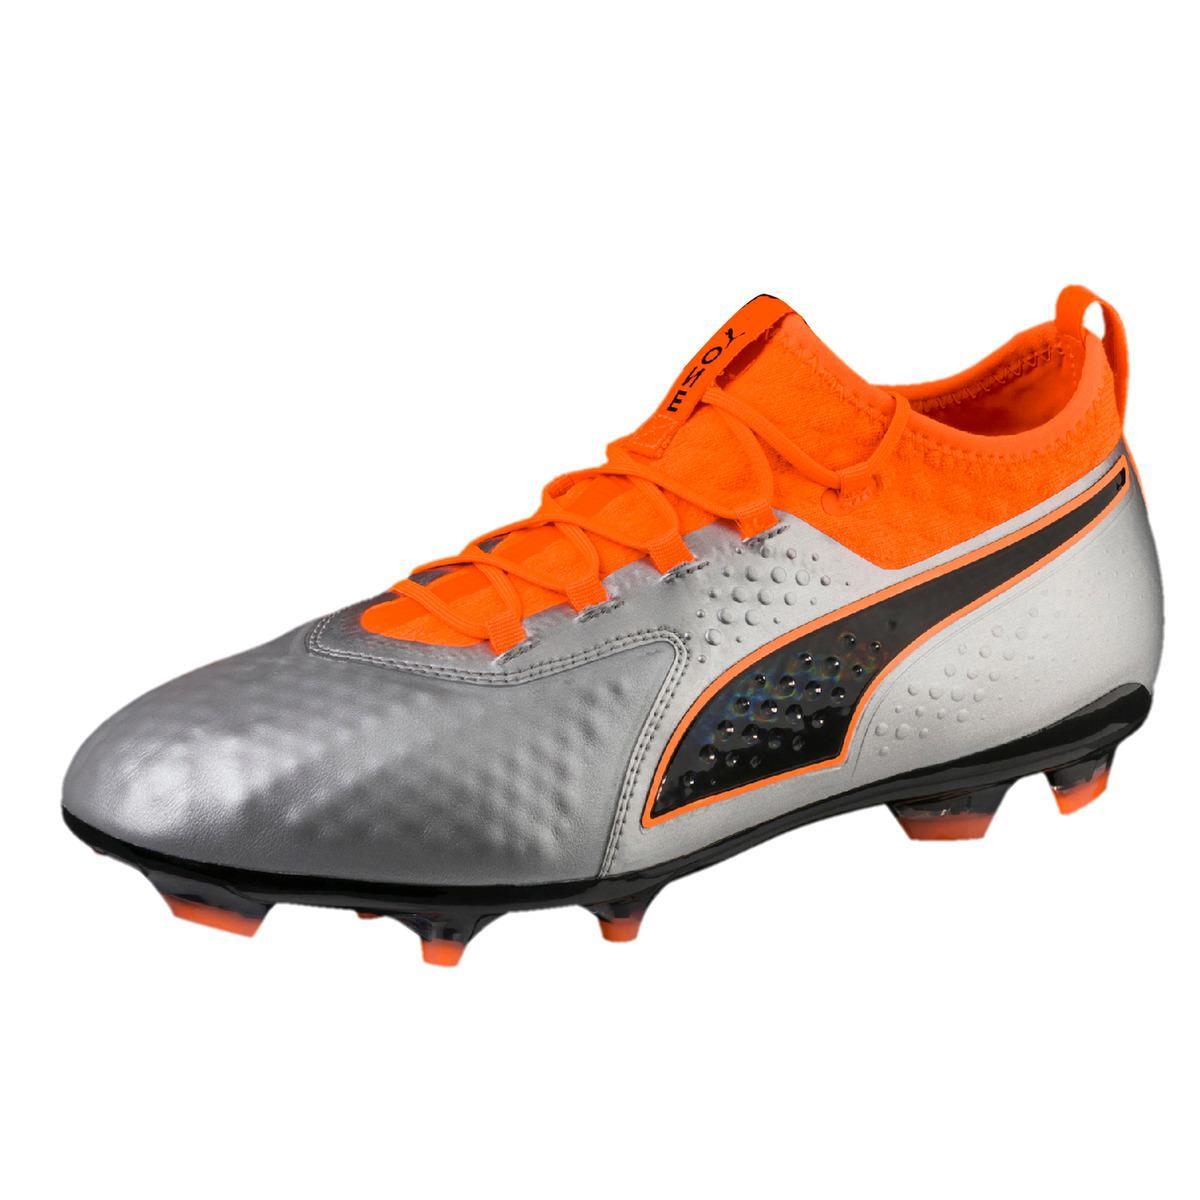 8efa0b23d2f Puma One 2 Lth (ag) Football Boots in Orange for Men - Lyst